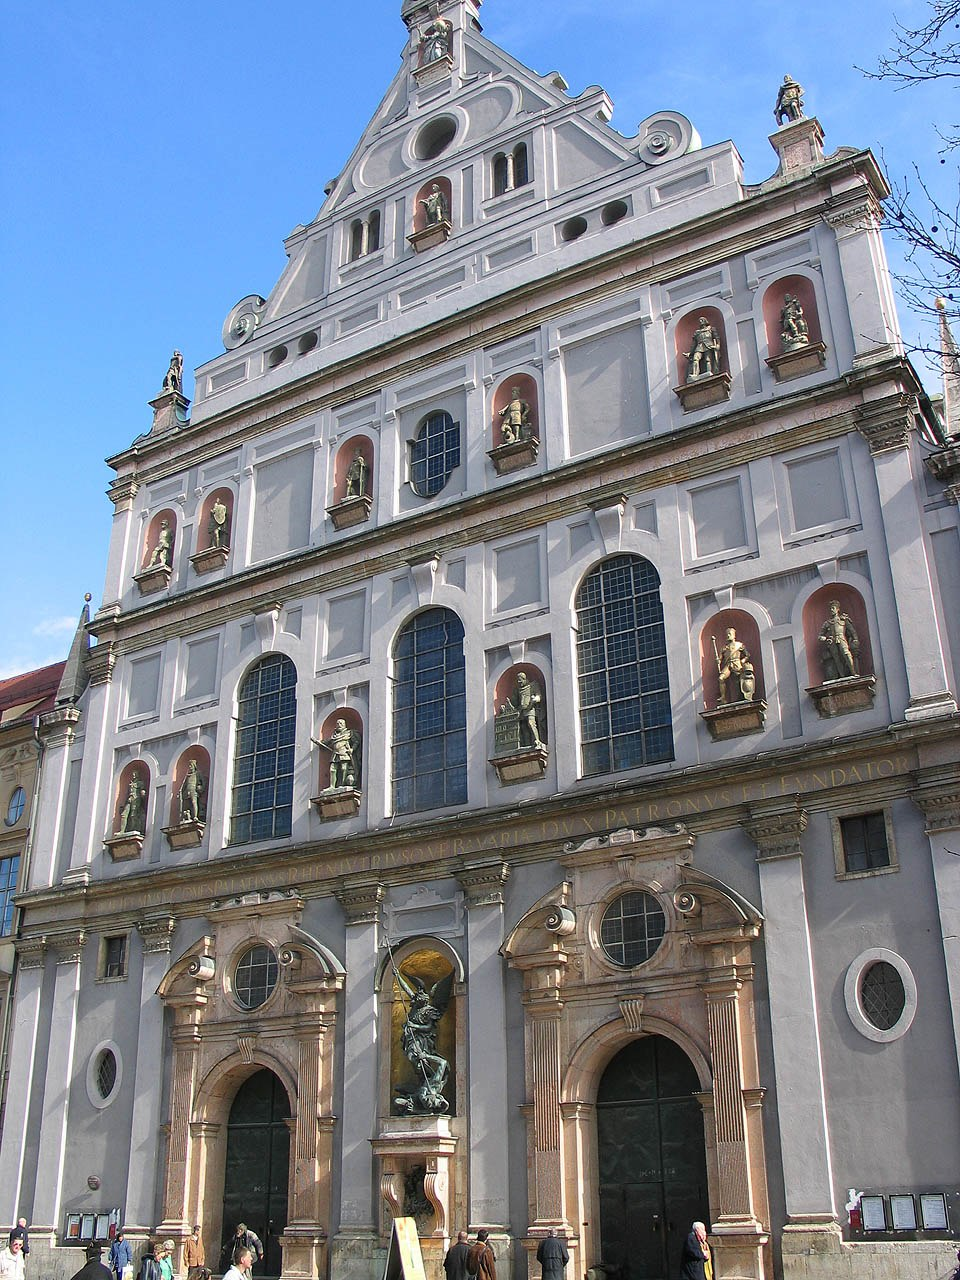 20060416-Michaelskirche Muenchen